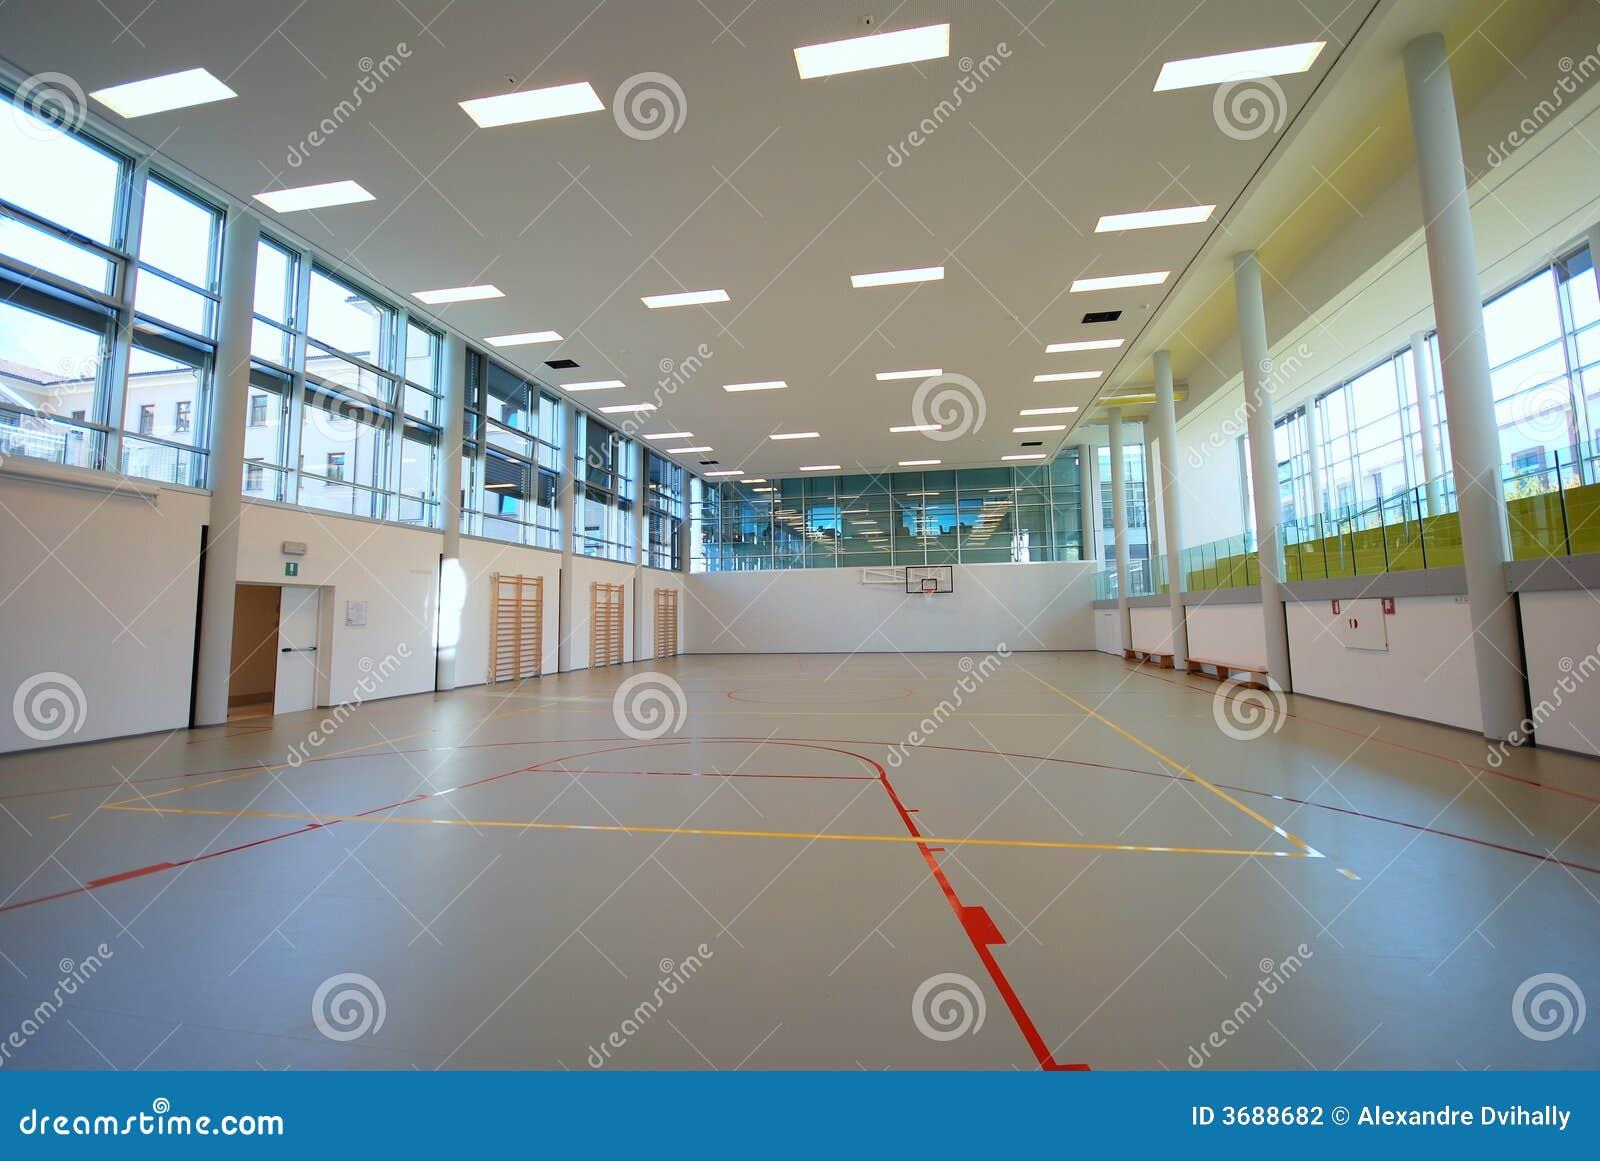 Indoor Sports Court Blueprints 2015 Home Design Ideas